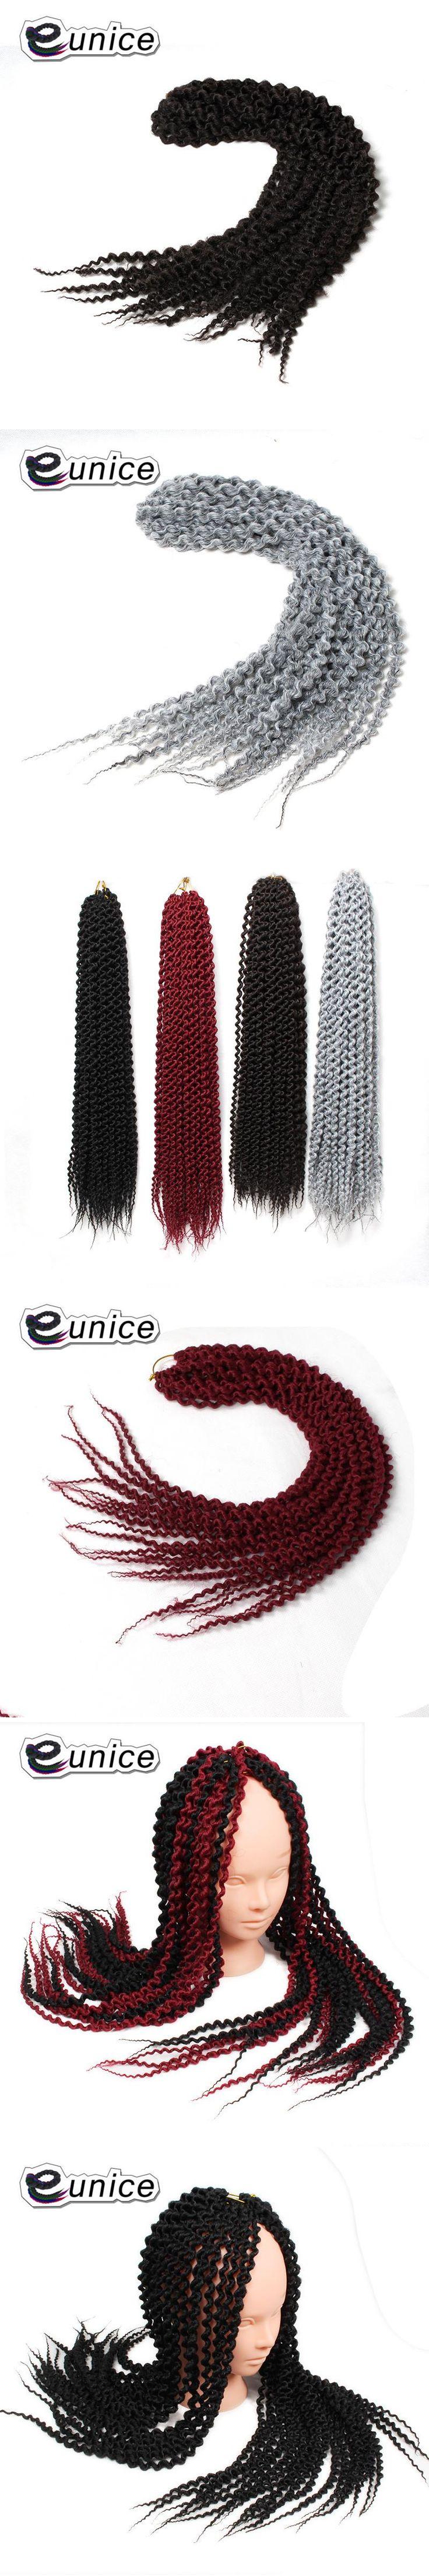 "Synthetic Braiding Hair Island braids 22"" unraveled Curly Senegalese Twist Braids BUG Grey Black High Temperature Fiber 1 pack"